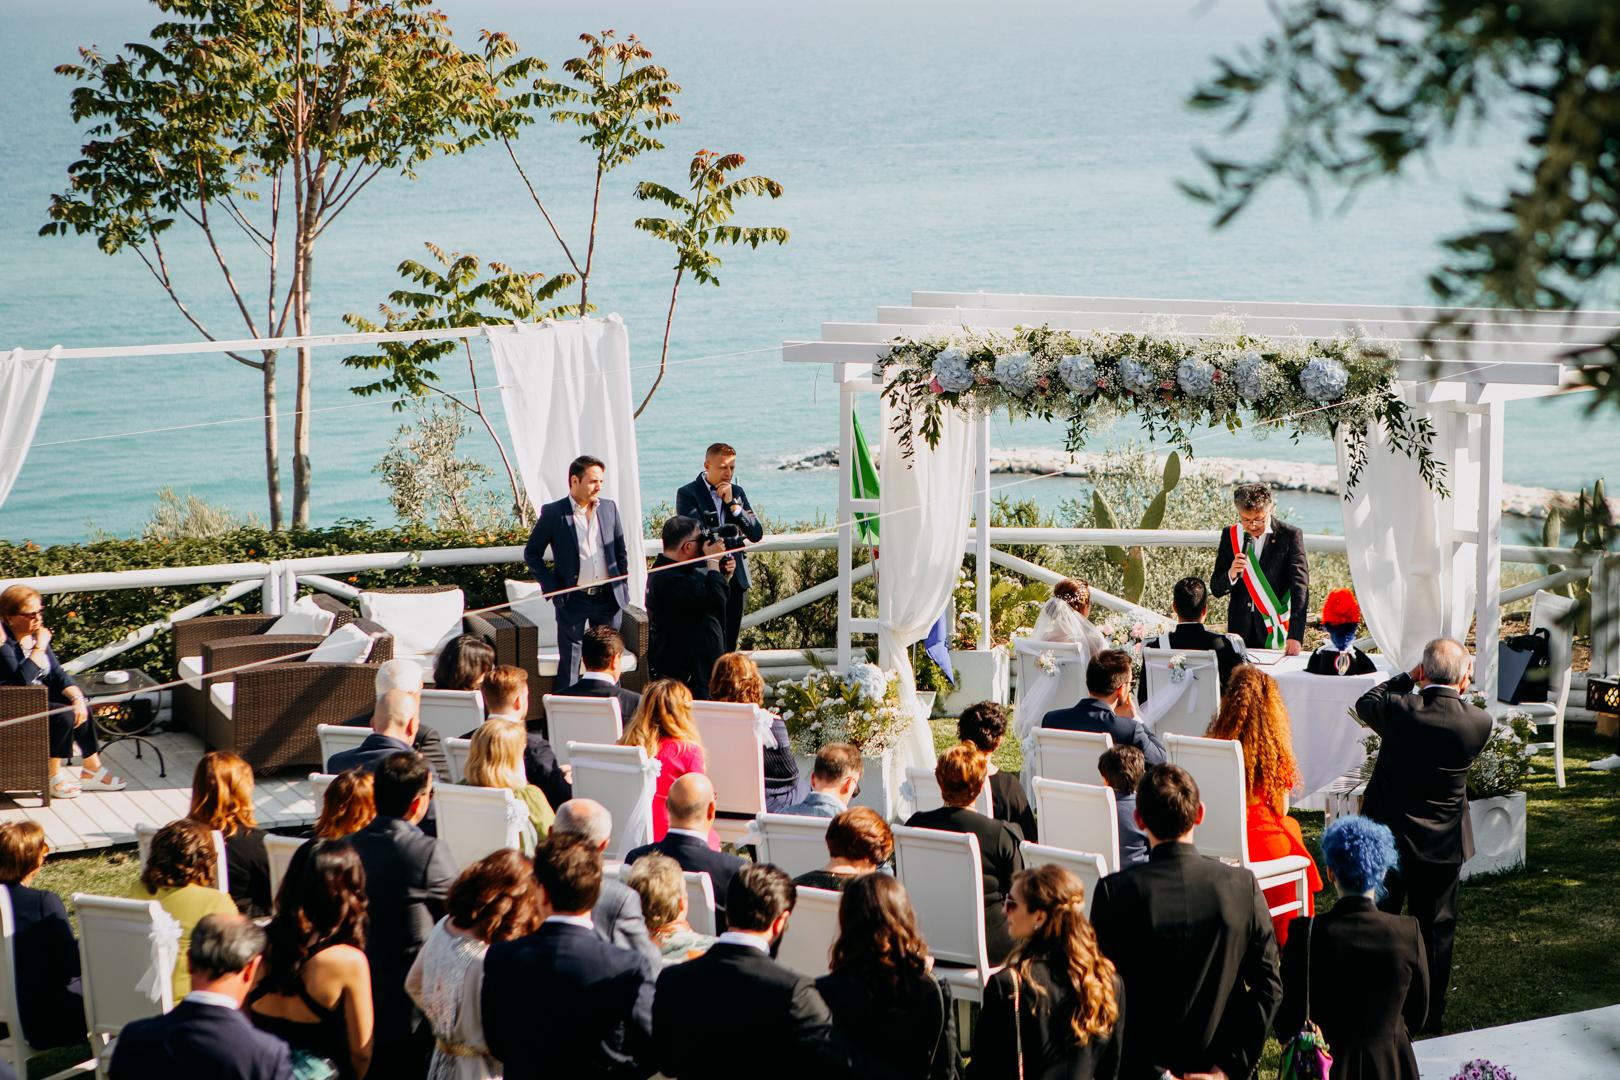 31 cerimonia-all'aperto-matrimonio-mare-gargano-vieste-peschici-gianni-lepore